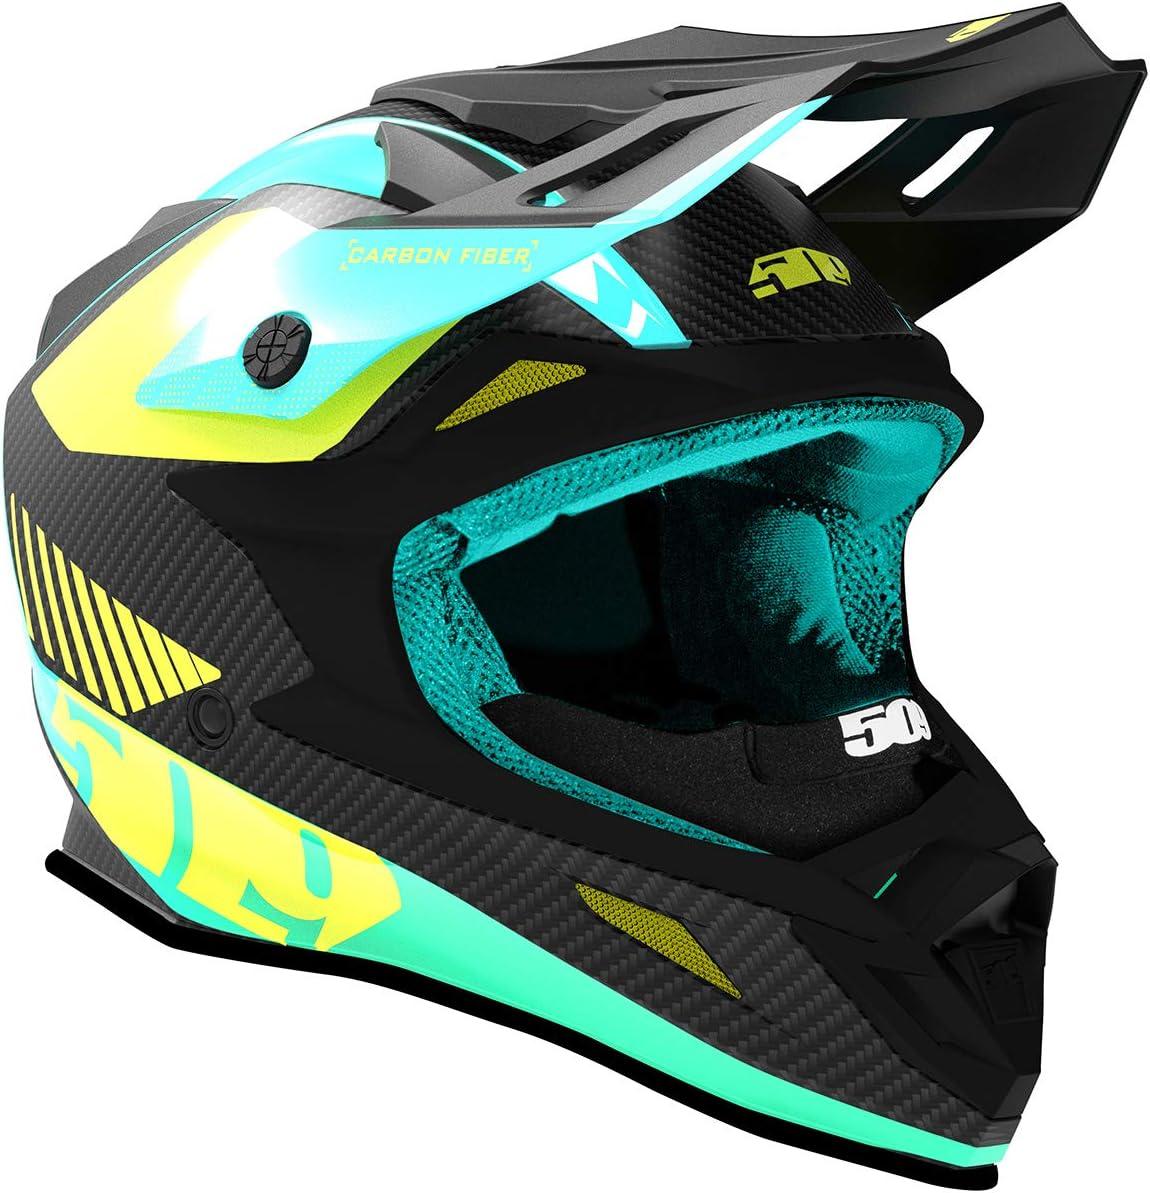 Teal - X-Large 509 Altitude Carbon Fiber Helmet with Fidlock